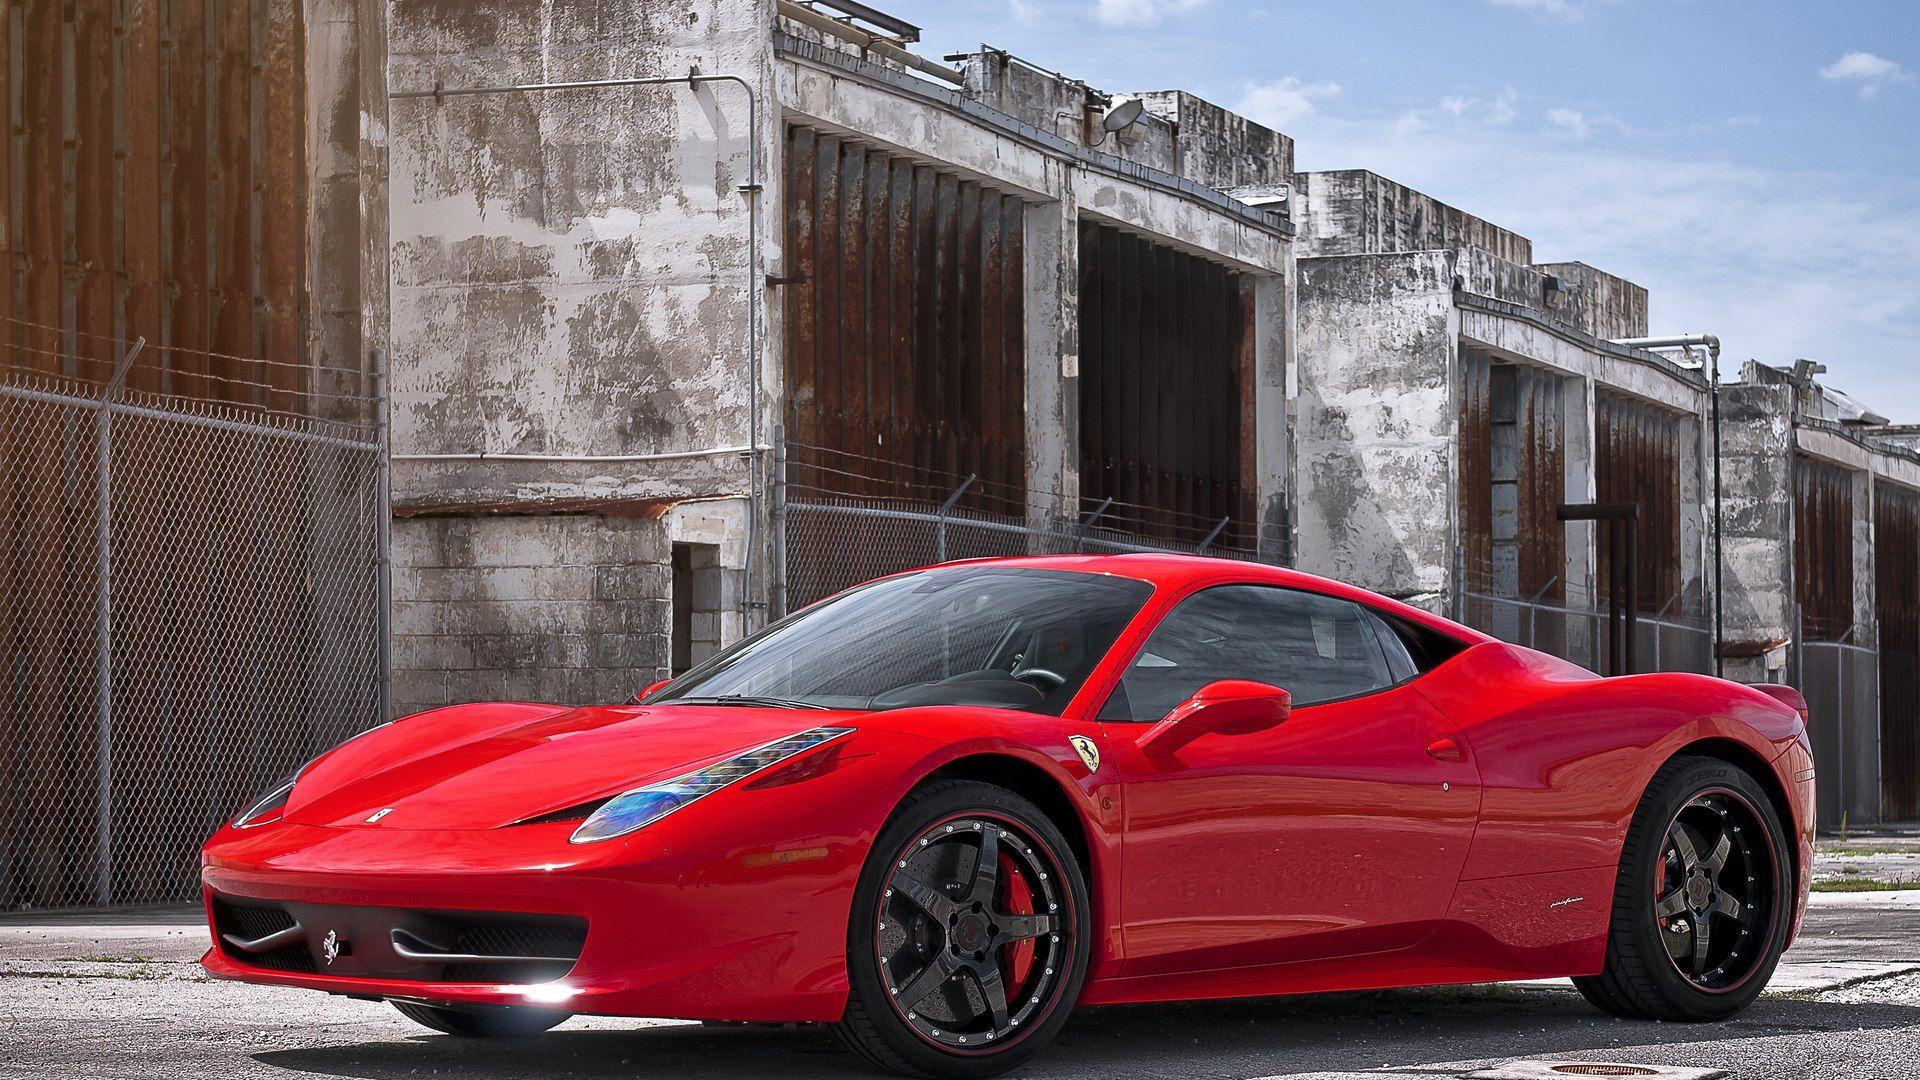 Red Love Red Ferrari Ferrari 458 Italia Ferrari 458